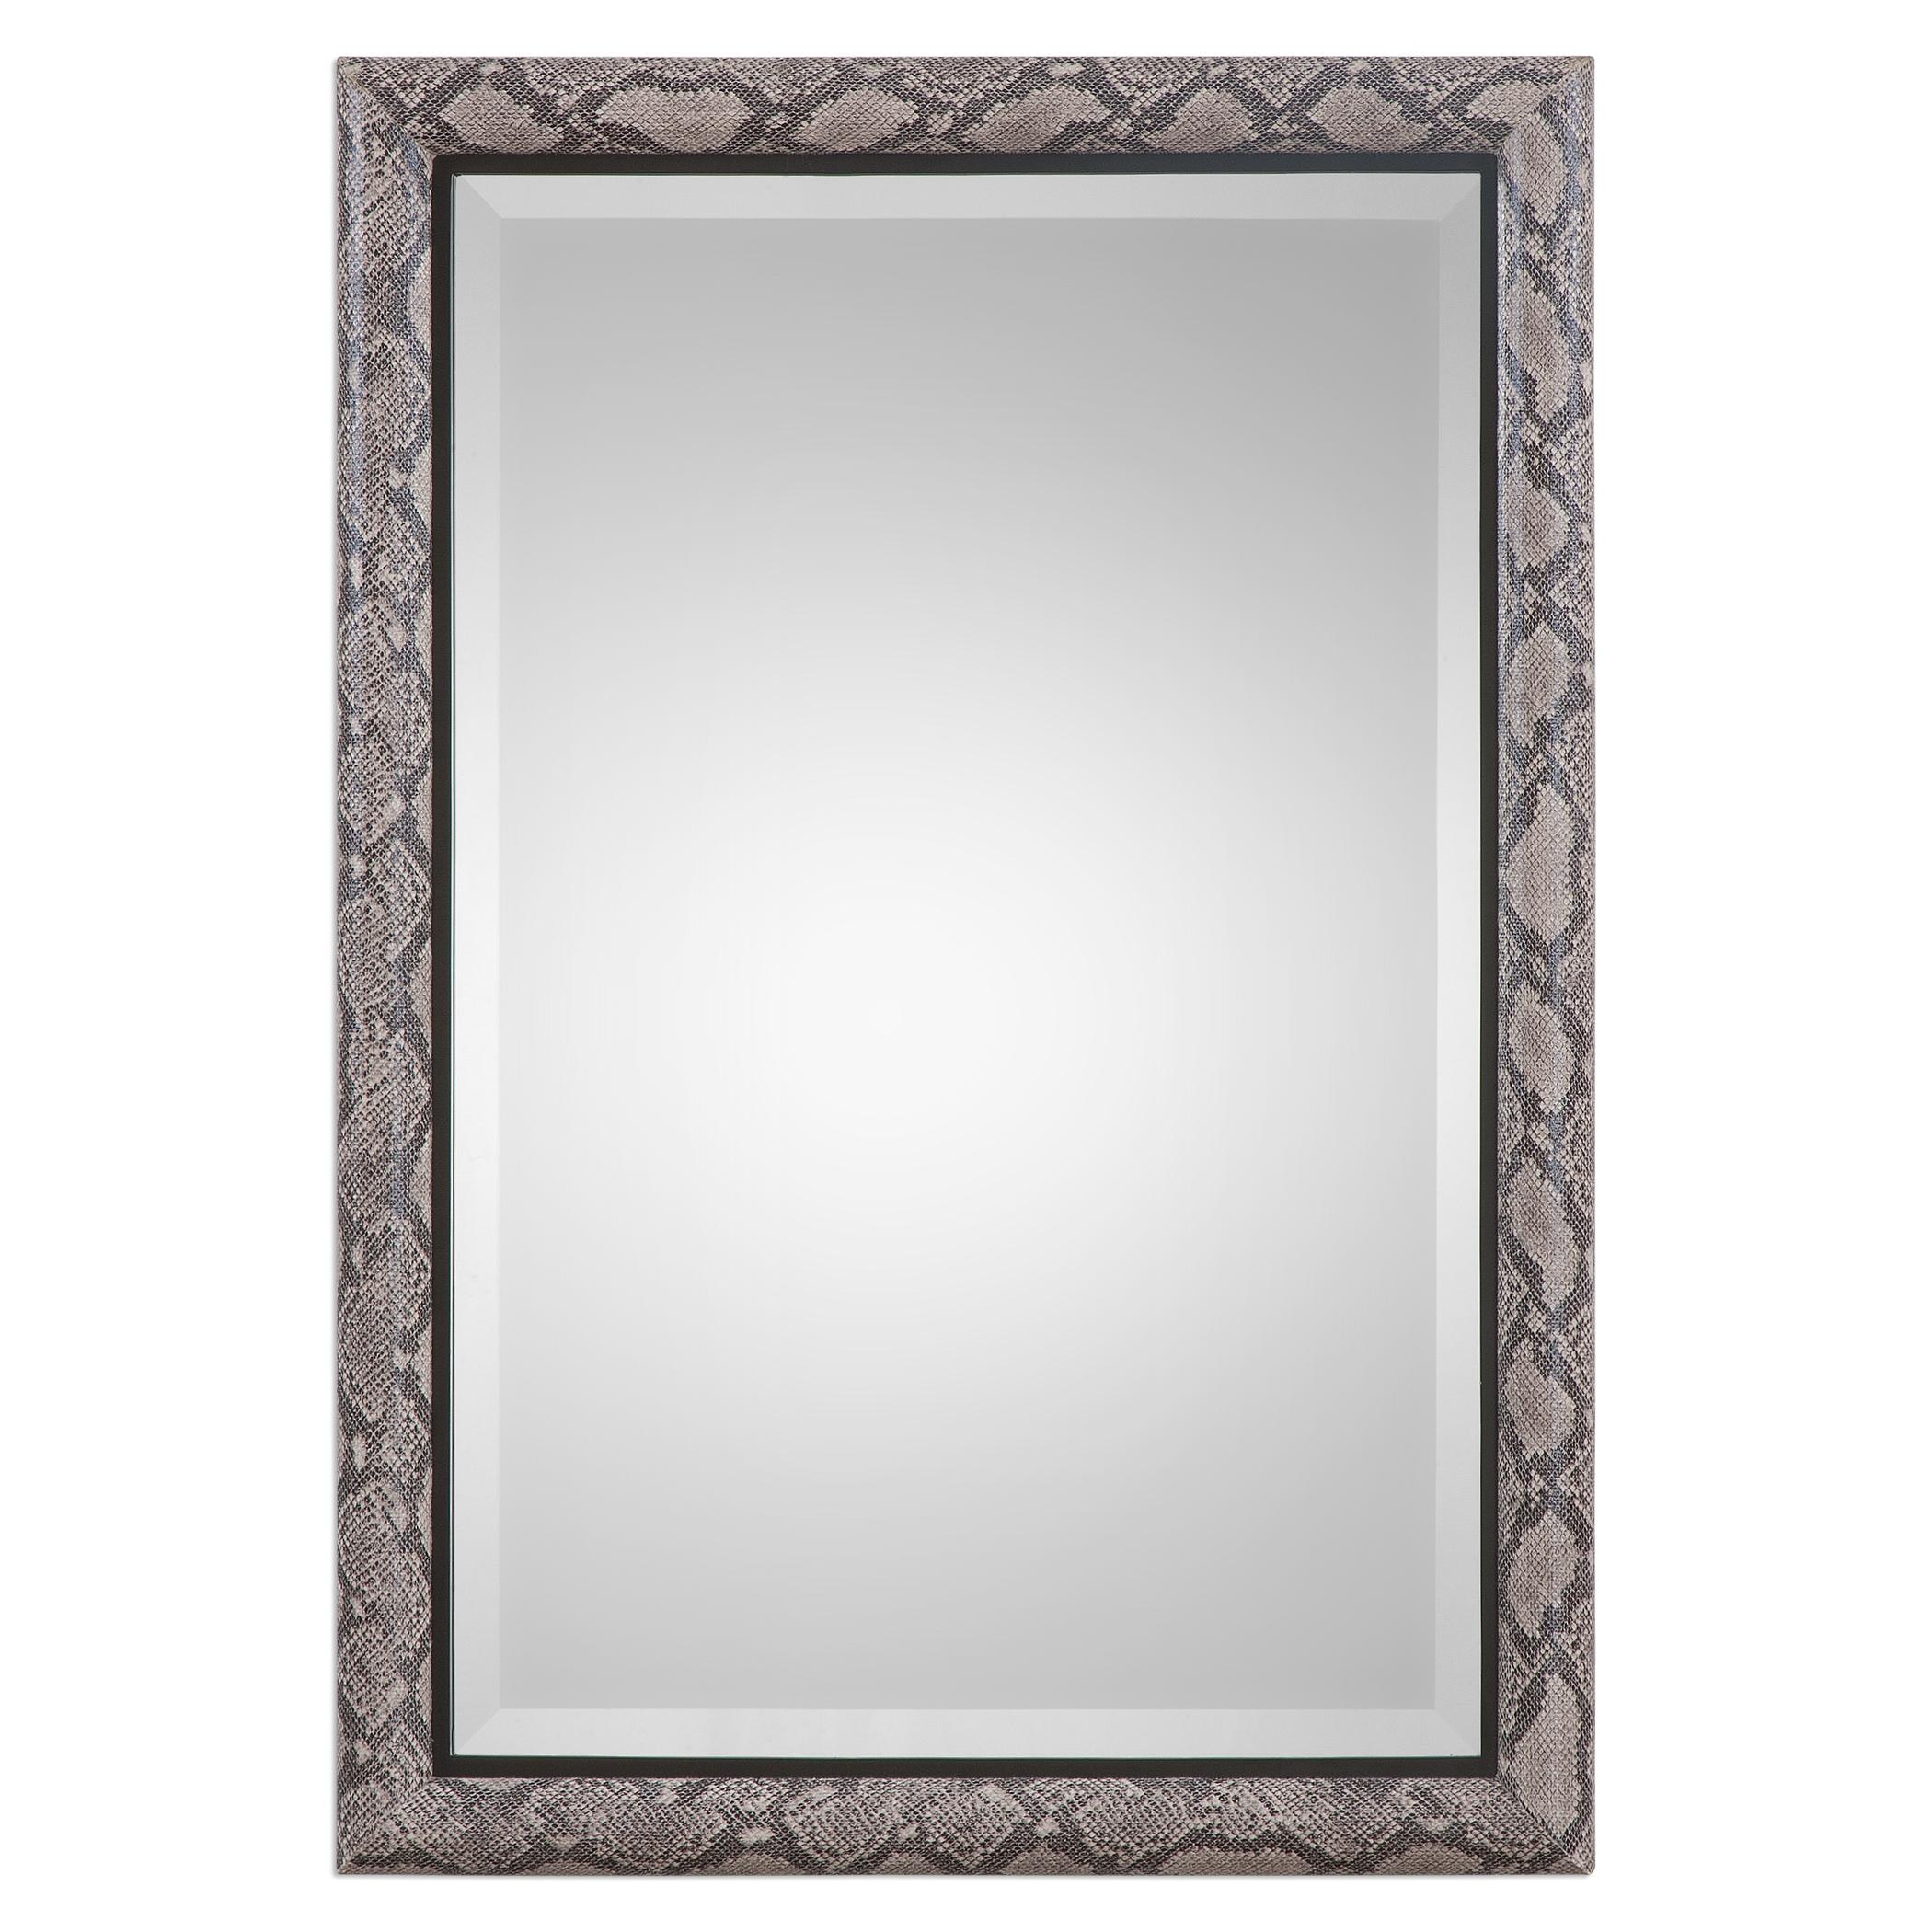 Uttermost Mirrors Drakon Snakeskin Mirror - Item Number: 09079